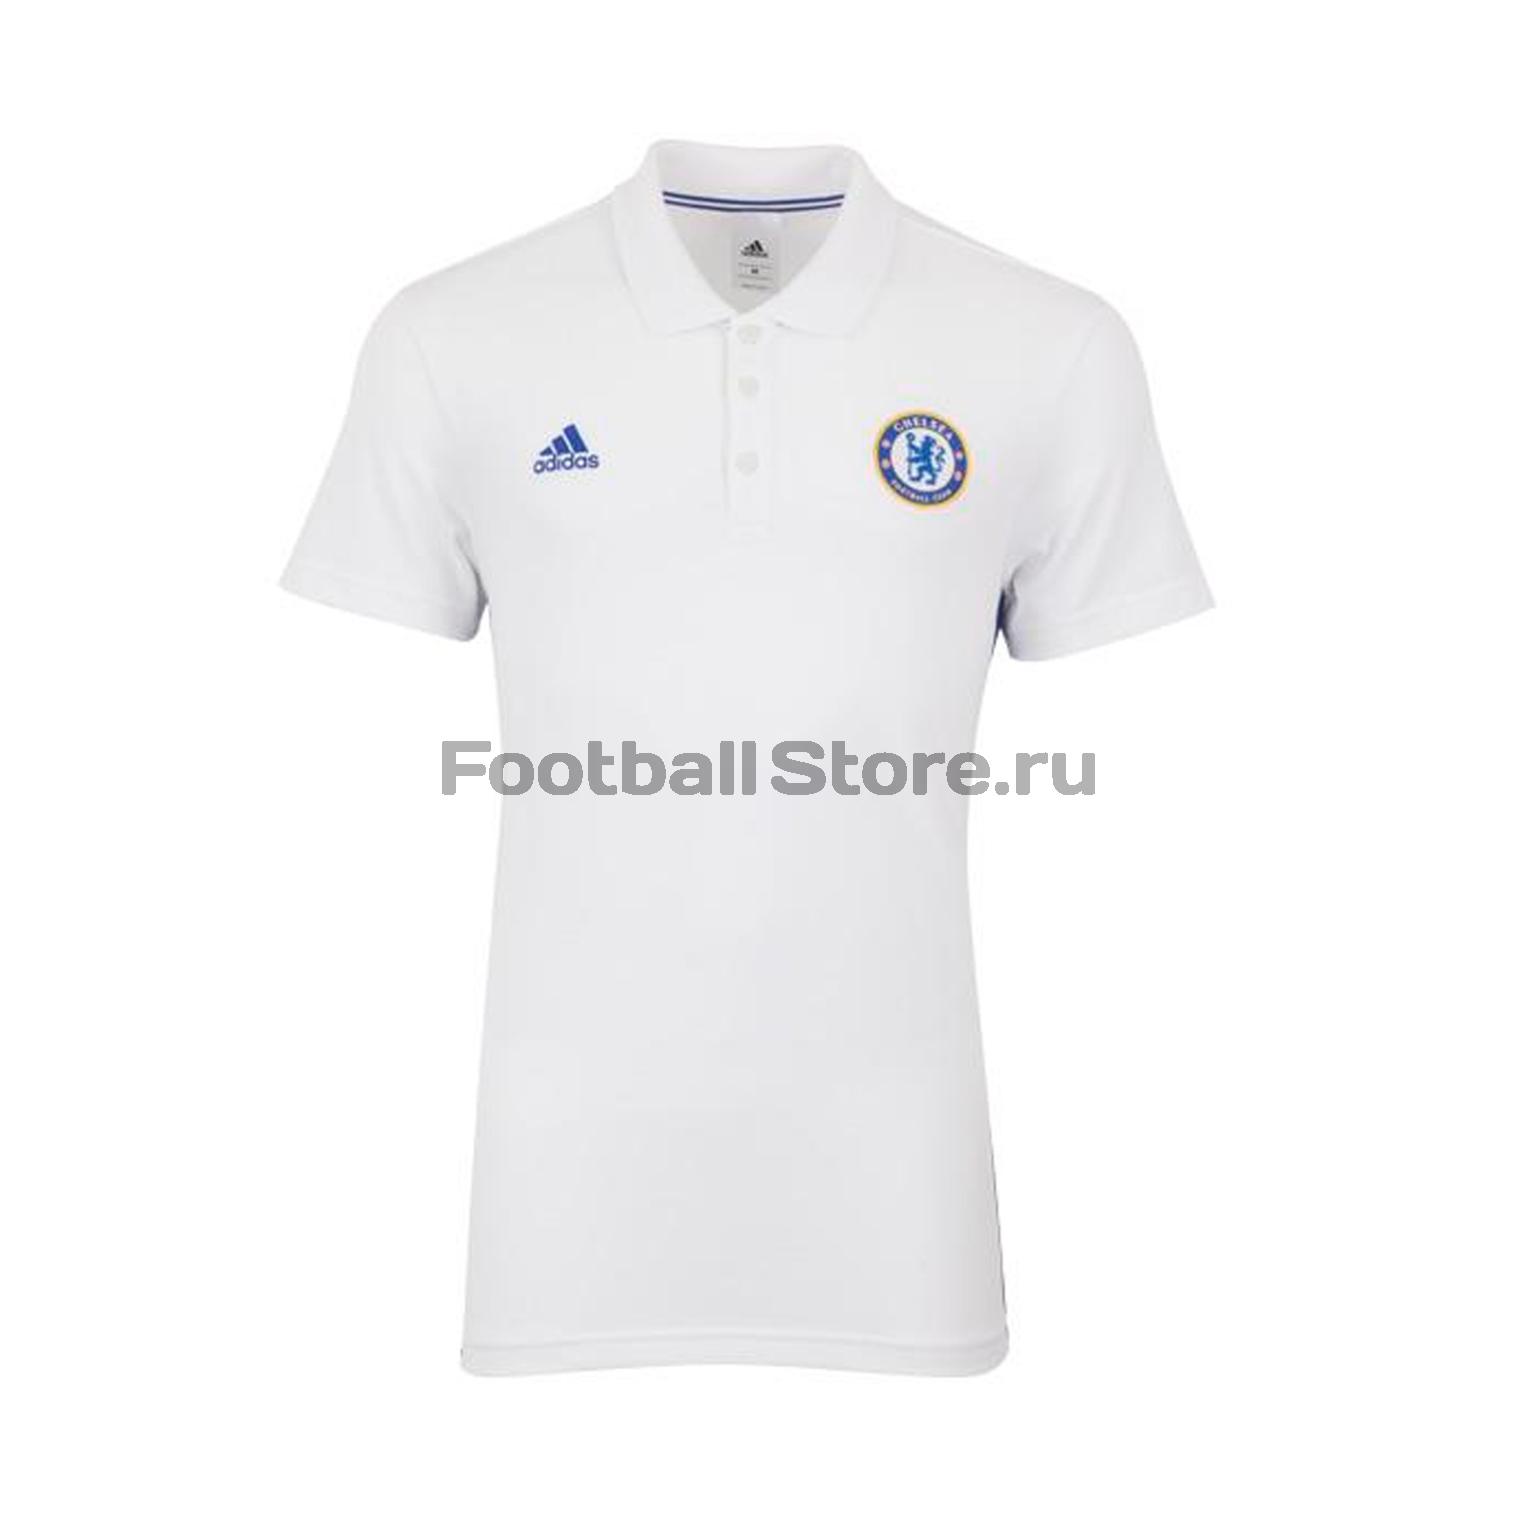 Chelsea Adidas Поло Adidas Chelsea 3S AP1548